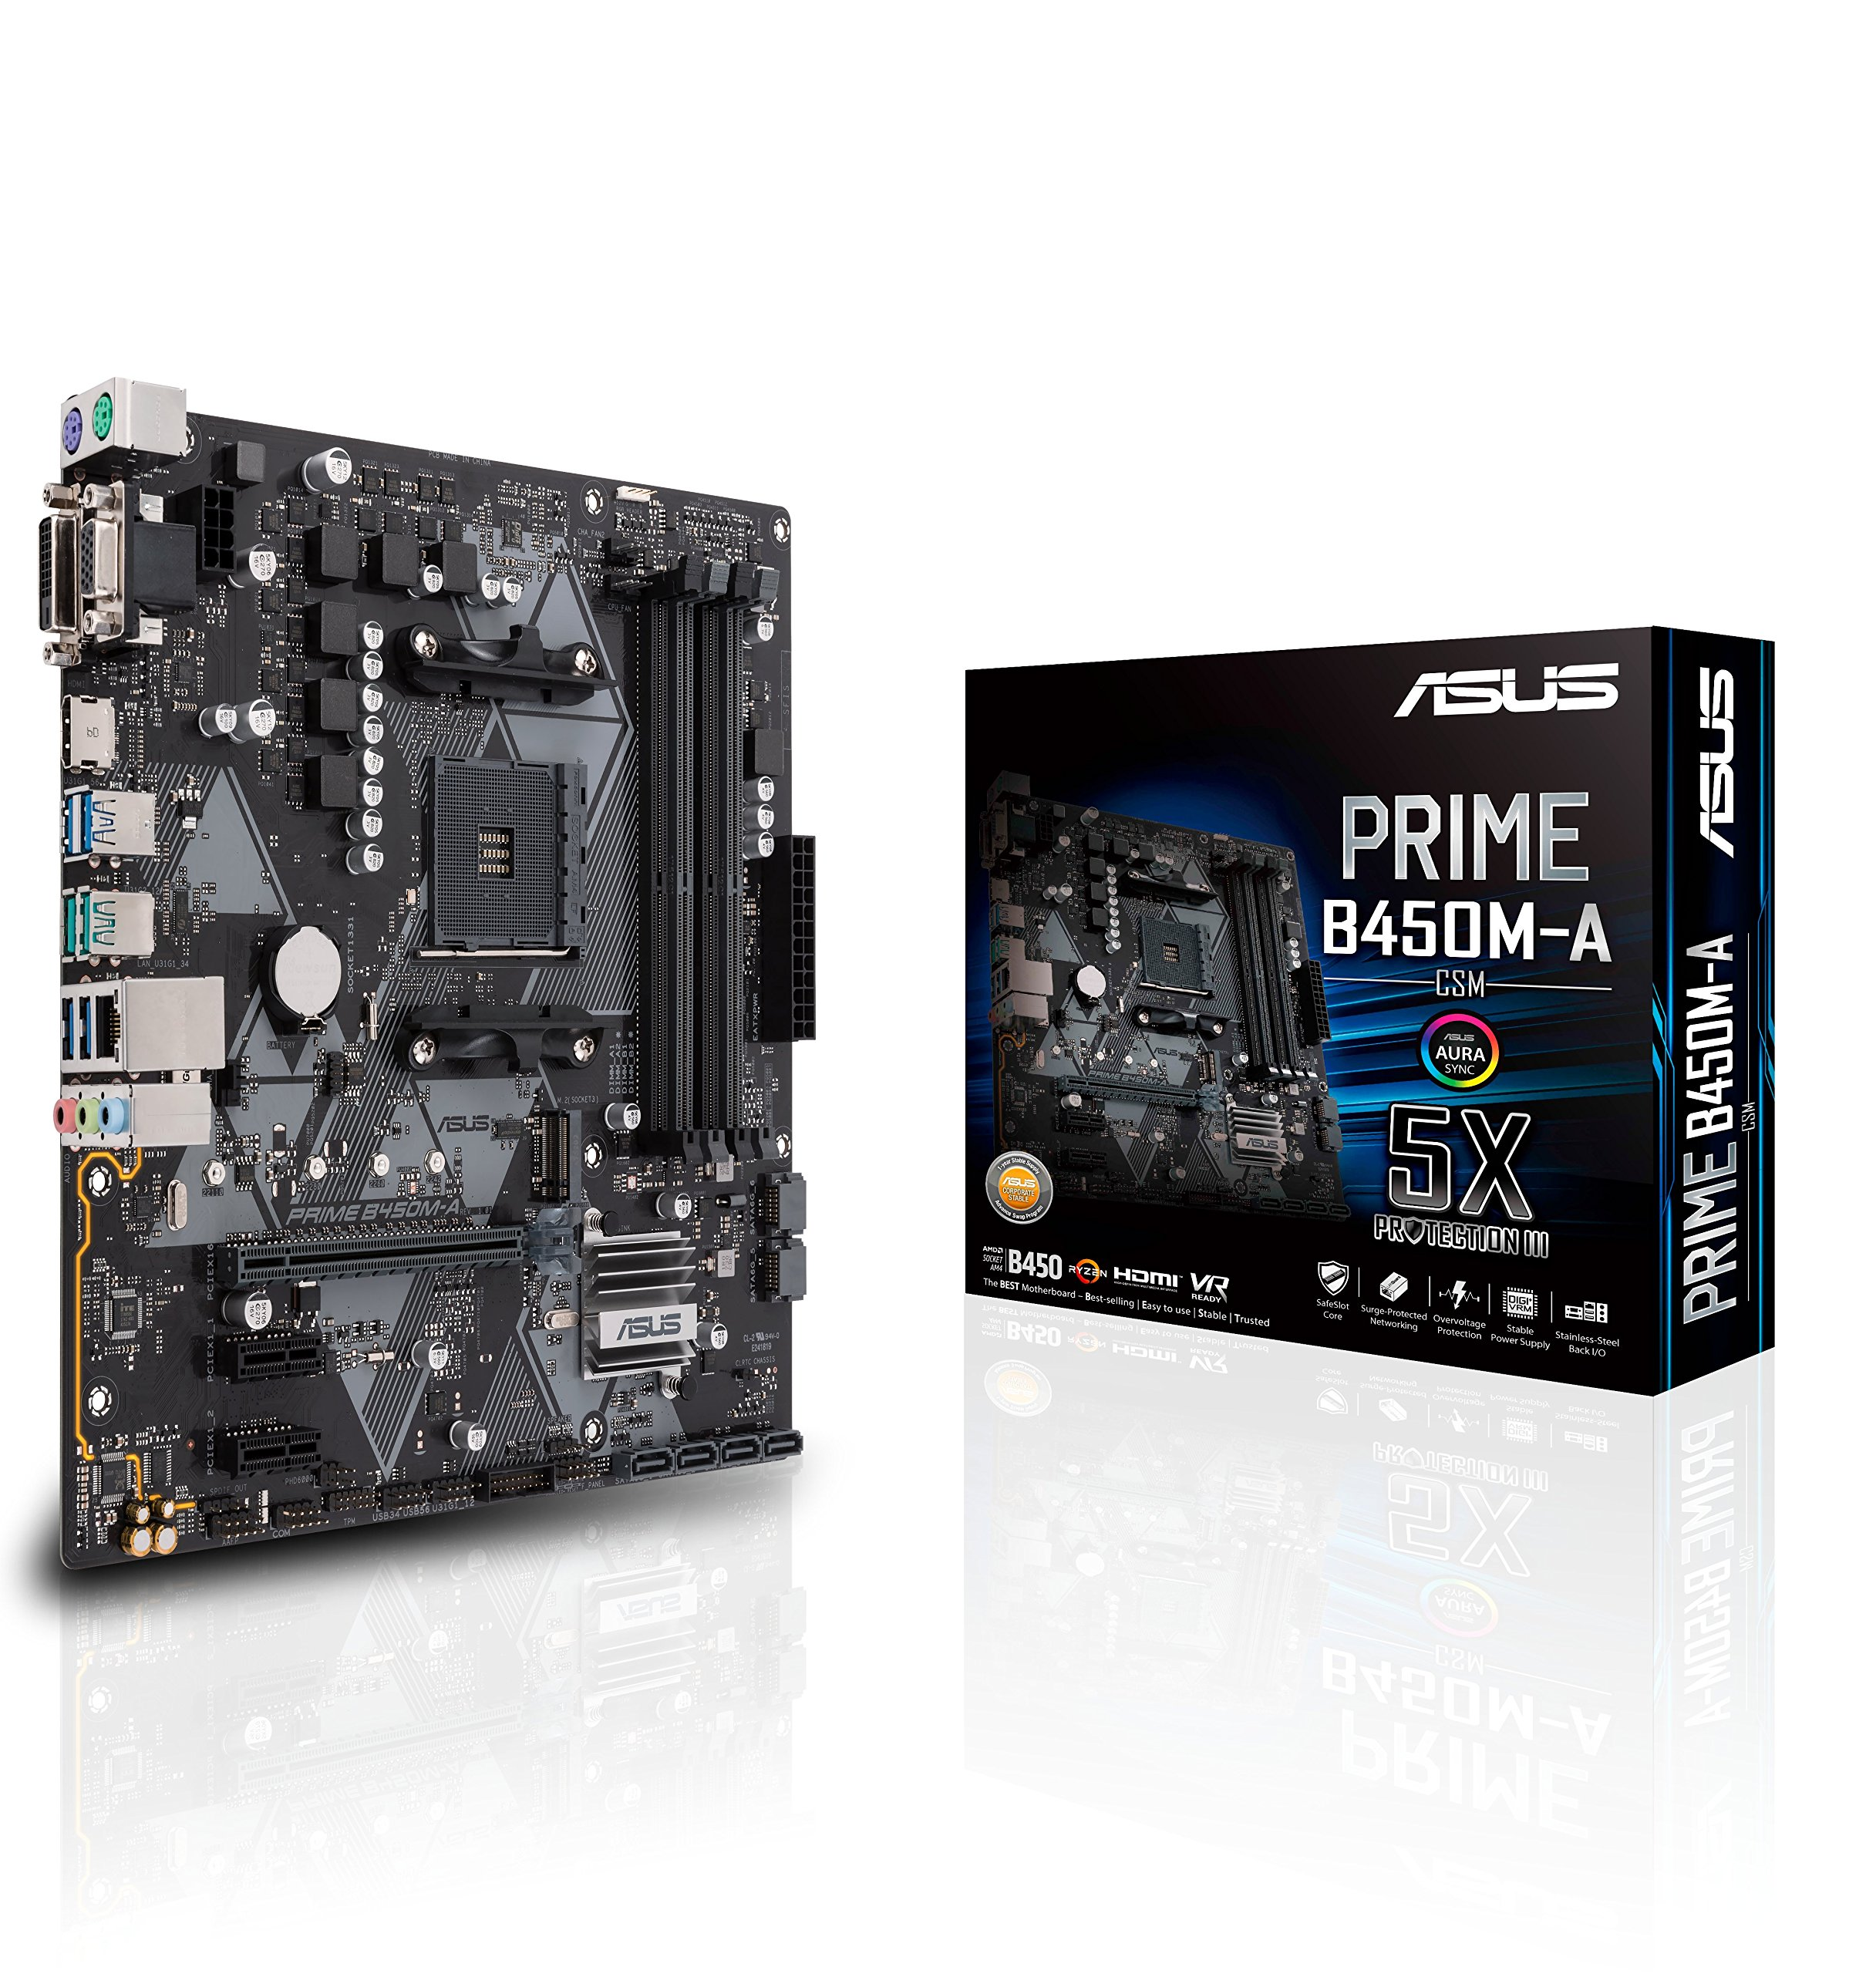 Asus Prime B450M-A/CSM AMD Ryzen 2 AM4 DDR4 HDMI DVI VGA M.2 USB 3.1 Gen2 mATX Motherboard by ASUS